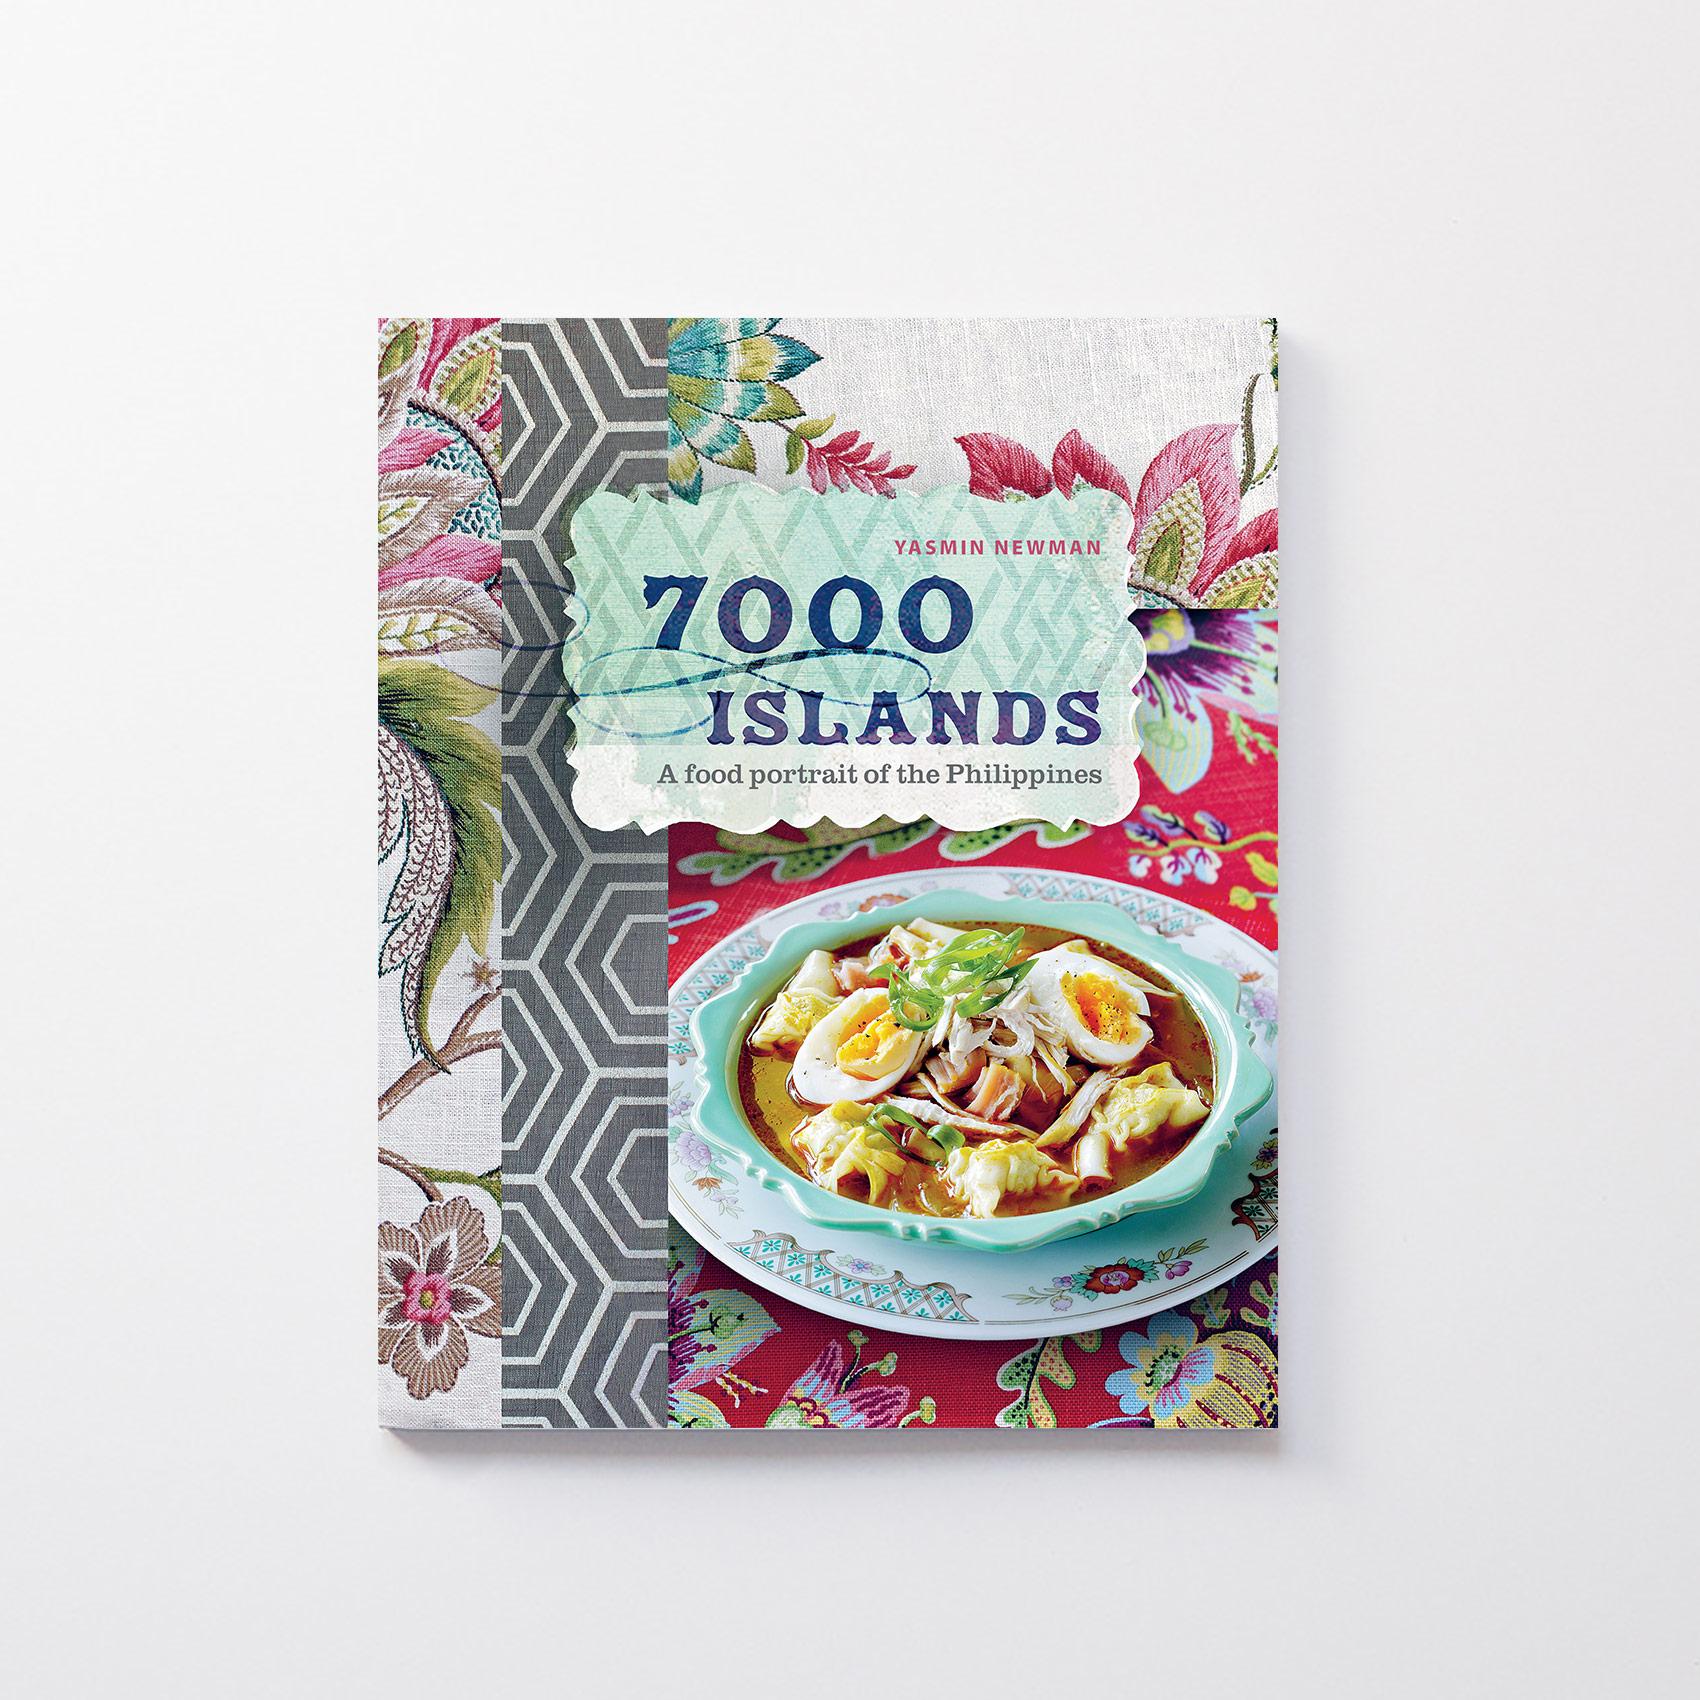 7000 Islands cookbook cover